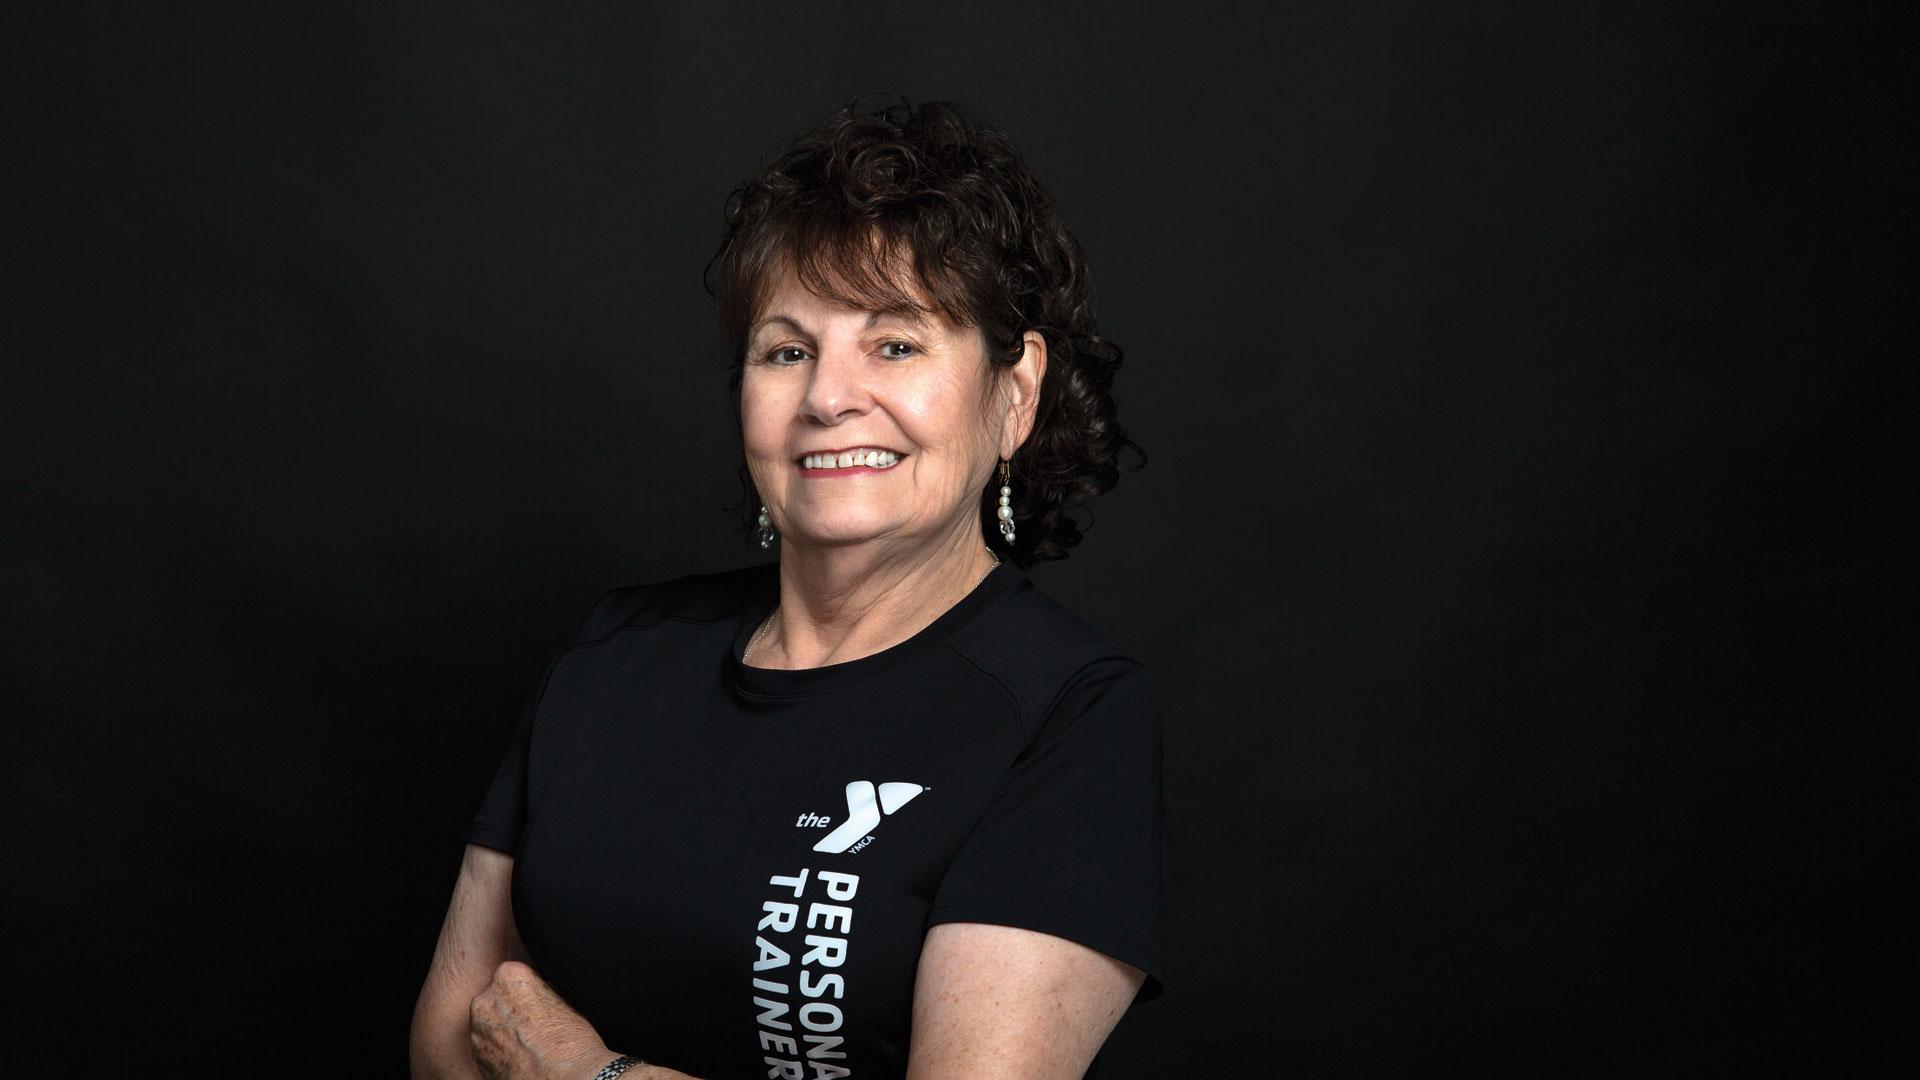 Susan Polhemus